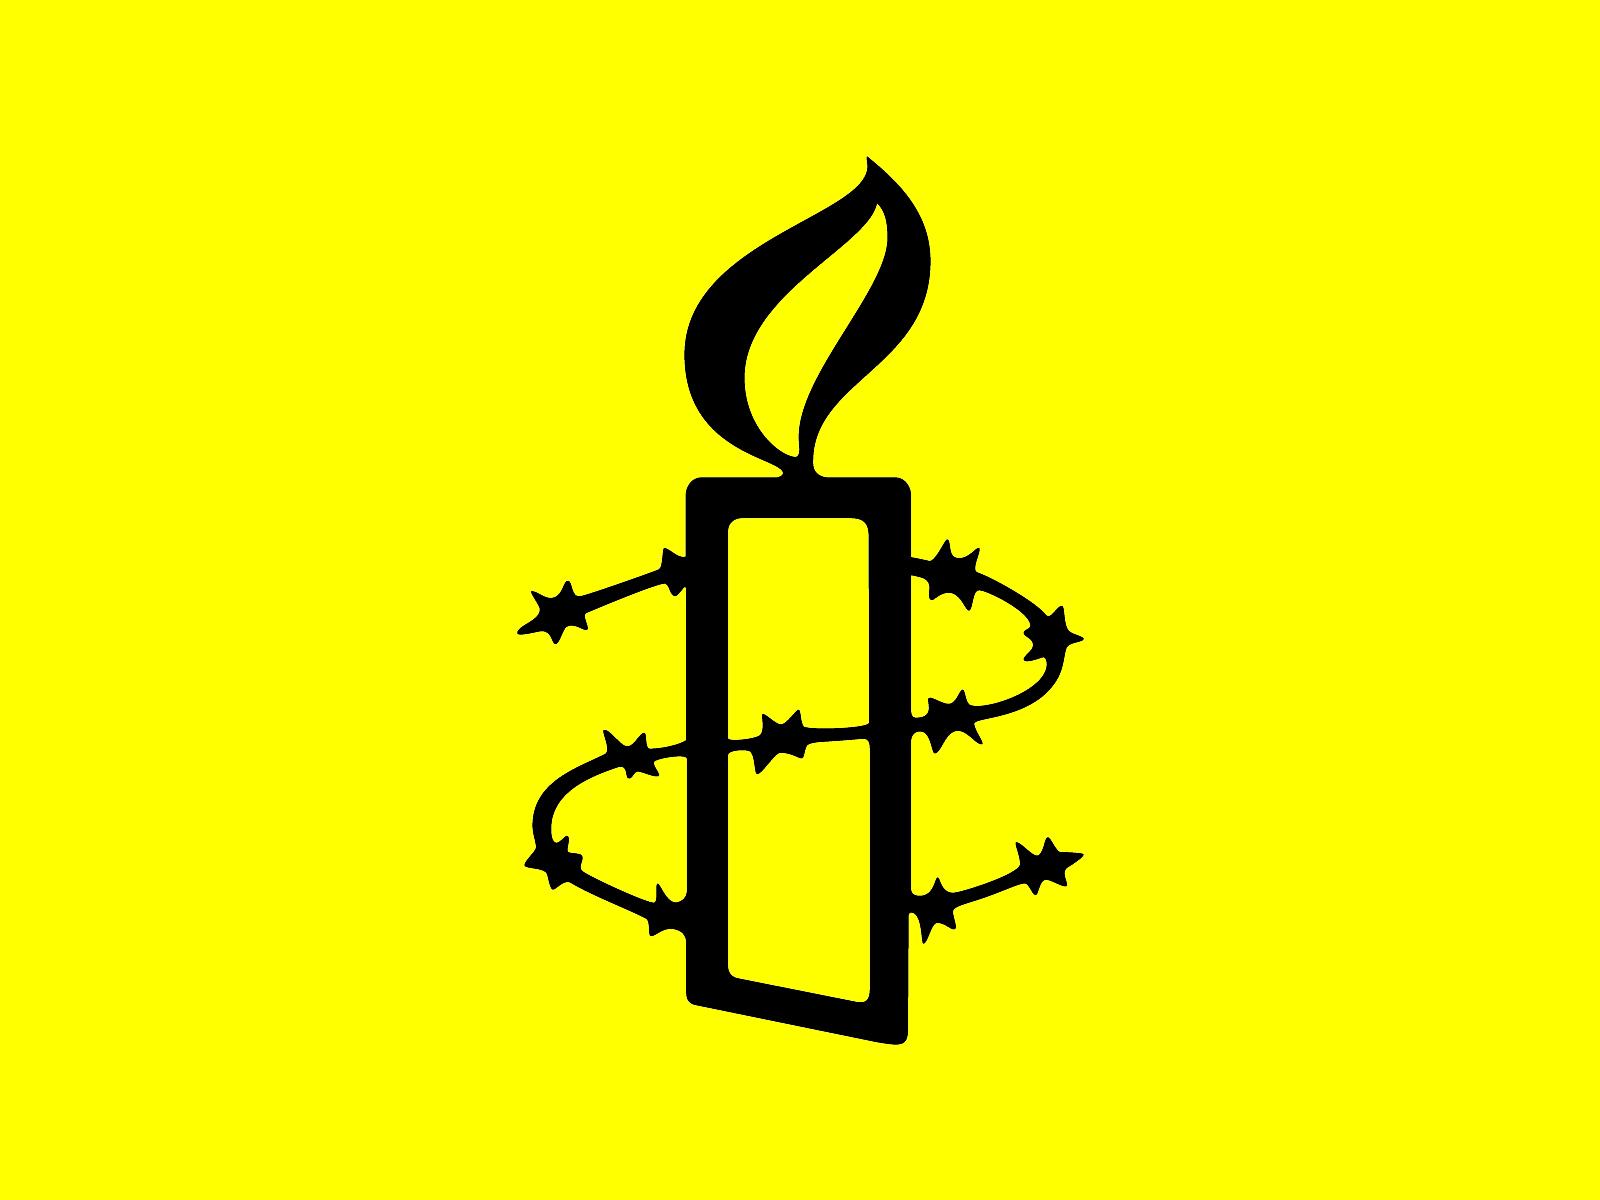 http://2.bp.blogspot.com/-d1v_rdFd0ME/TaG3du-ybWI/AAAAAAAABW0/NZlbT6DLYE0/s1600/amnesty1600x1200.png